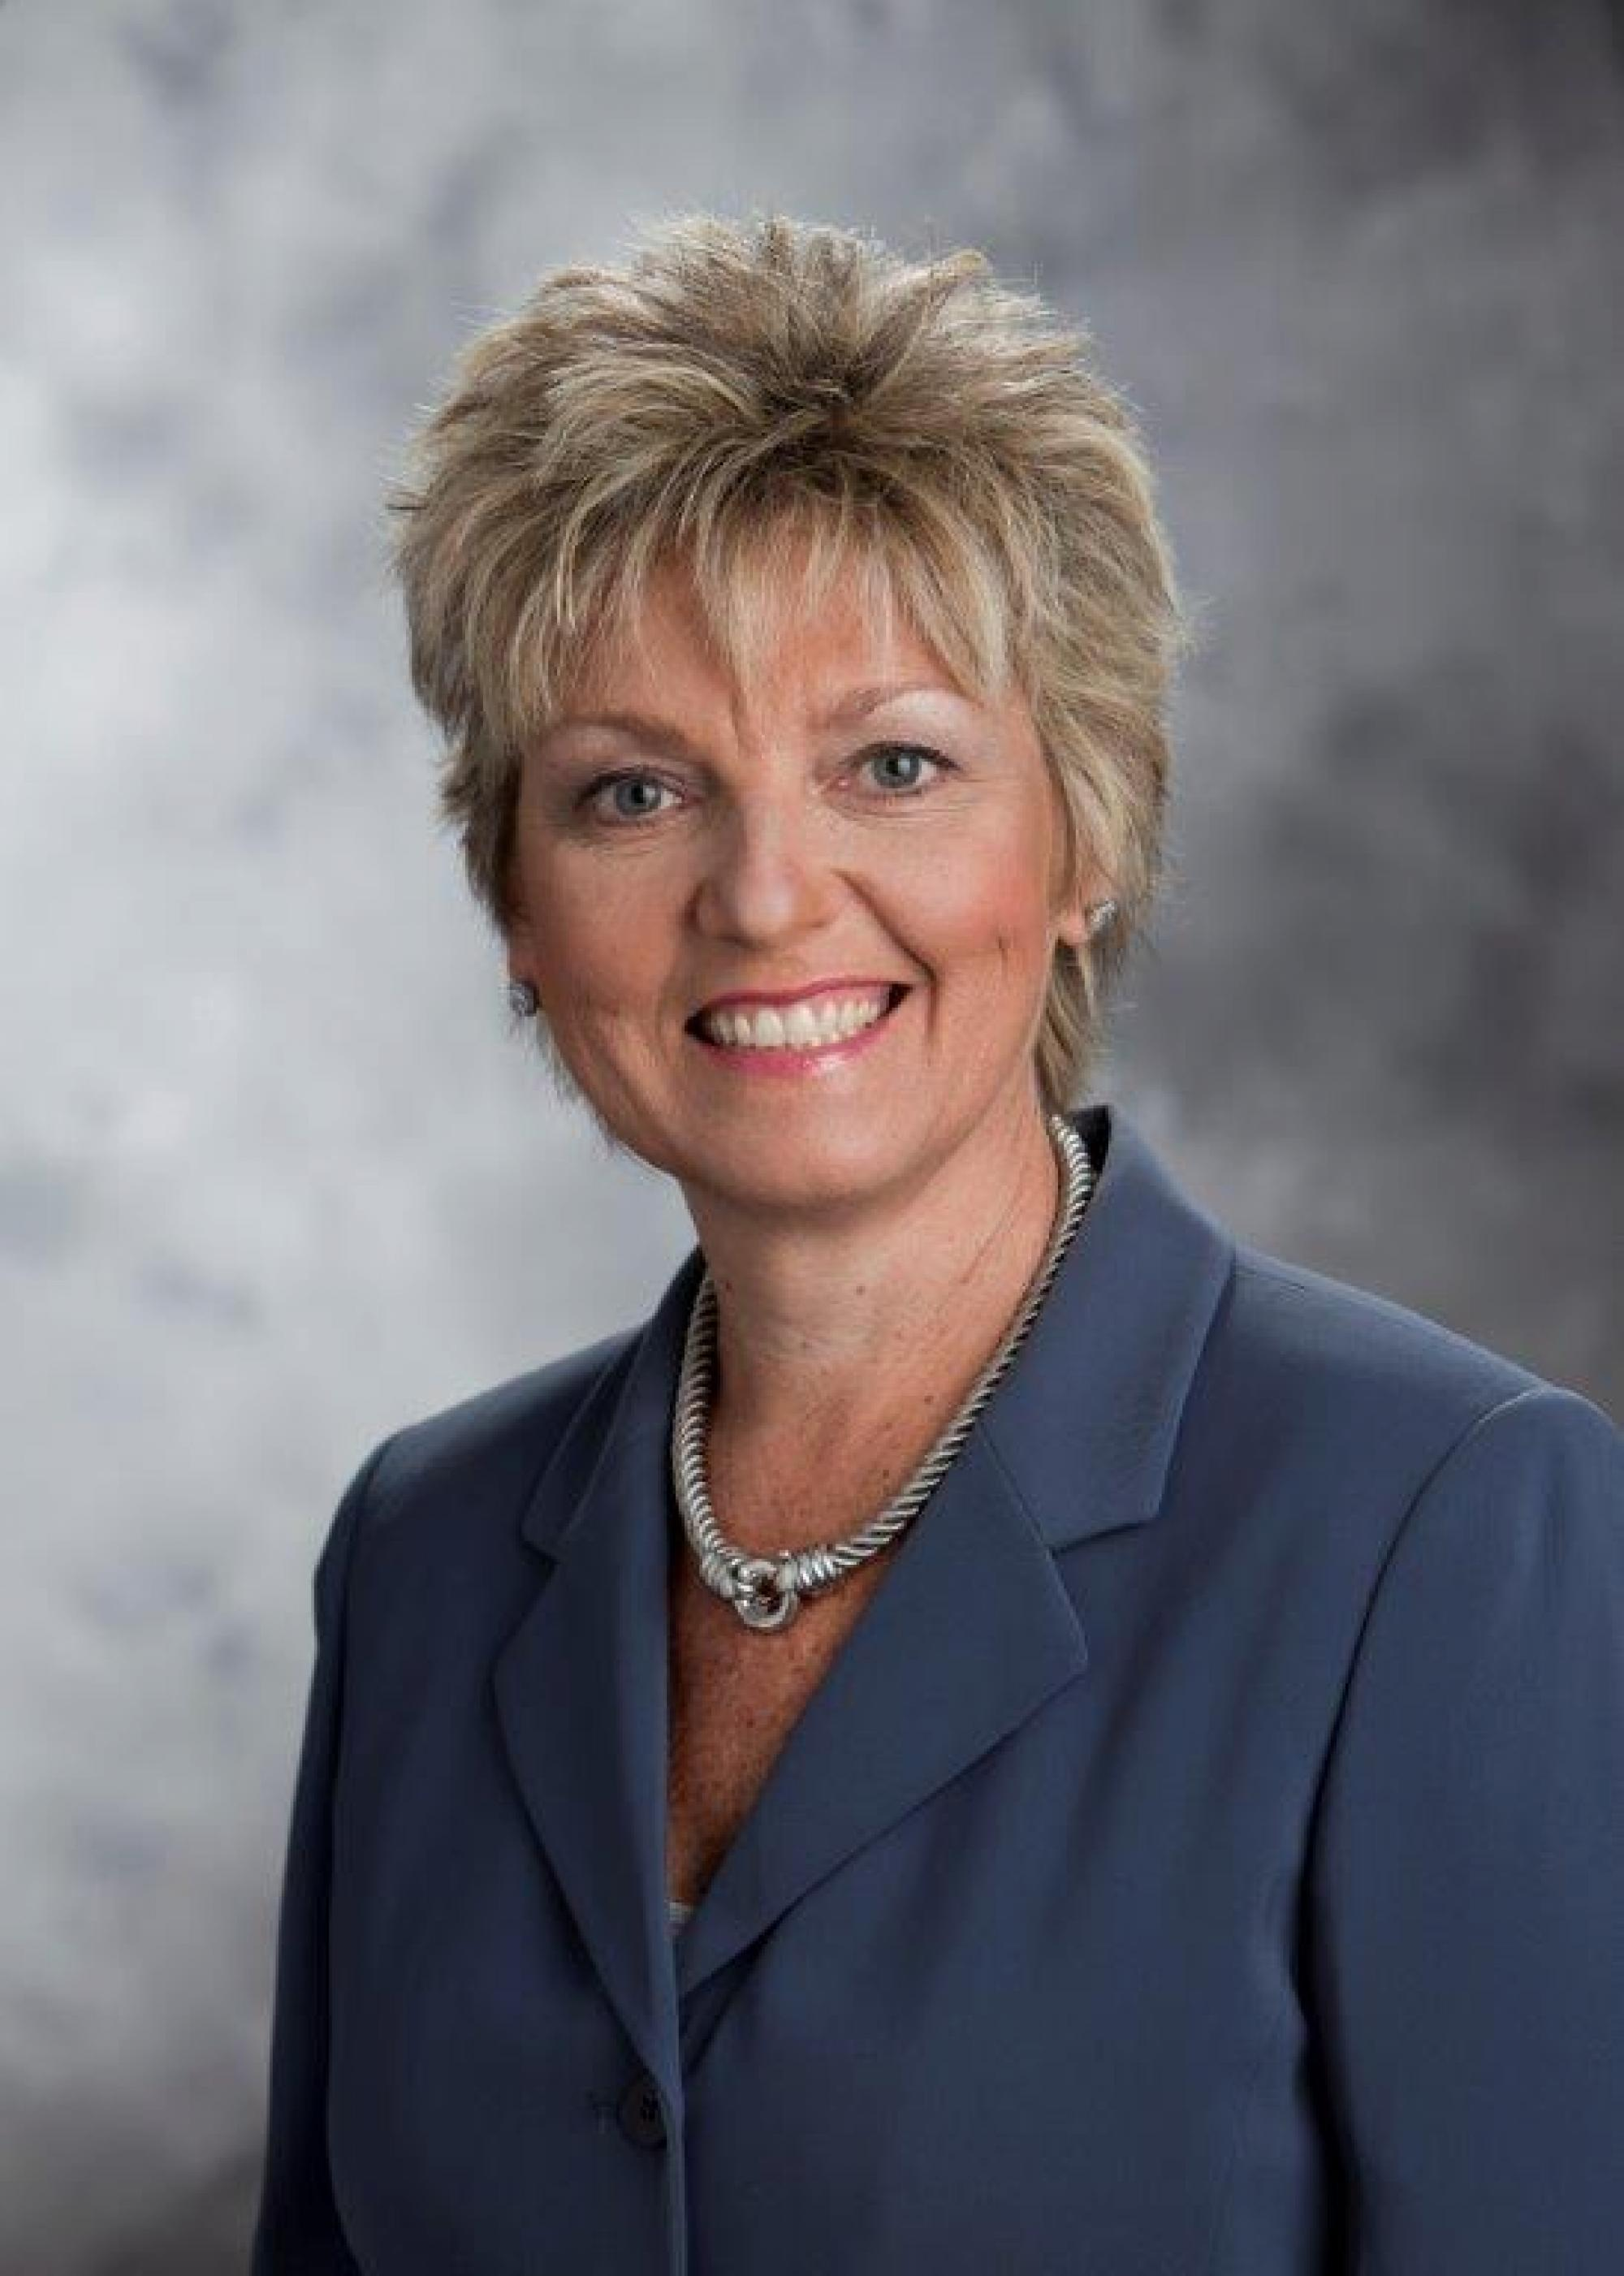 Kathy Bollinger